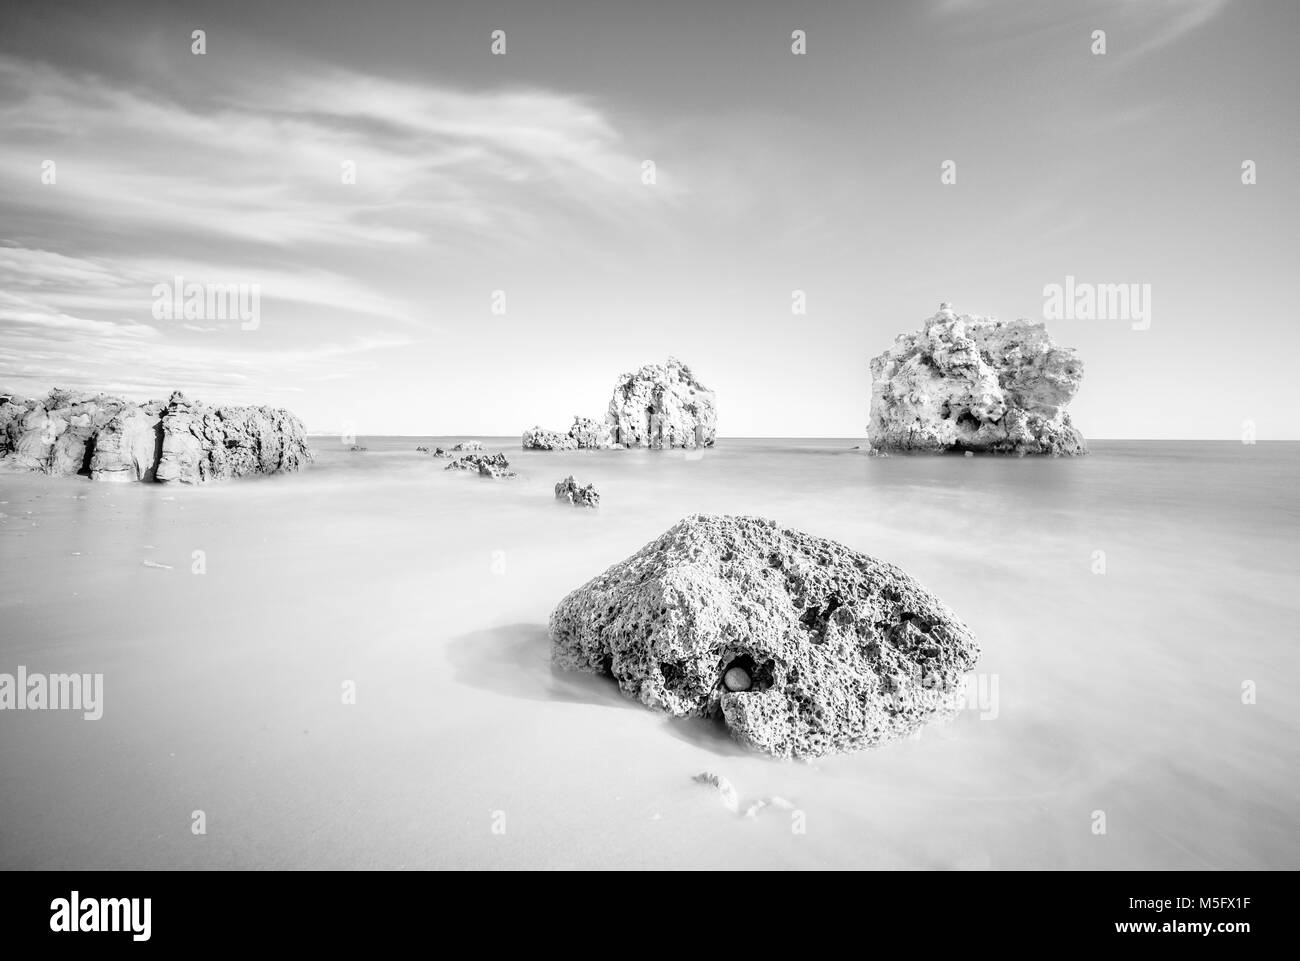 | Algarve | Portugal Os três Arrifes Albufeira | Nikon D750 | Lente 12-24mm | ISO 100, f/8, 13,0 s Imagen De Stock